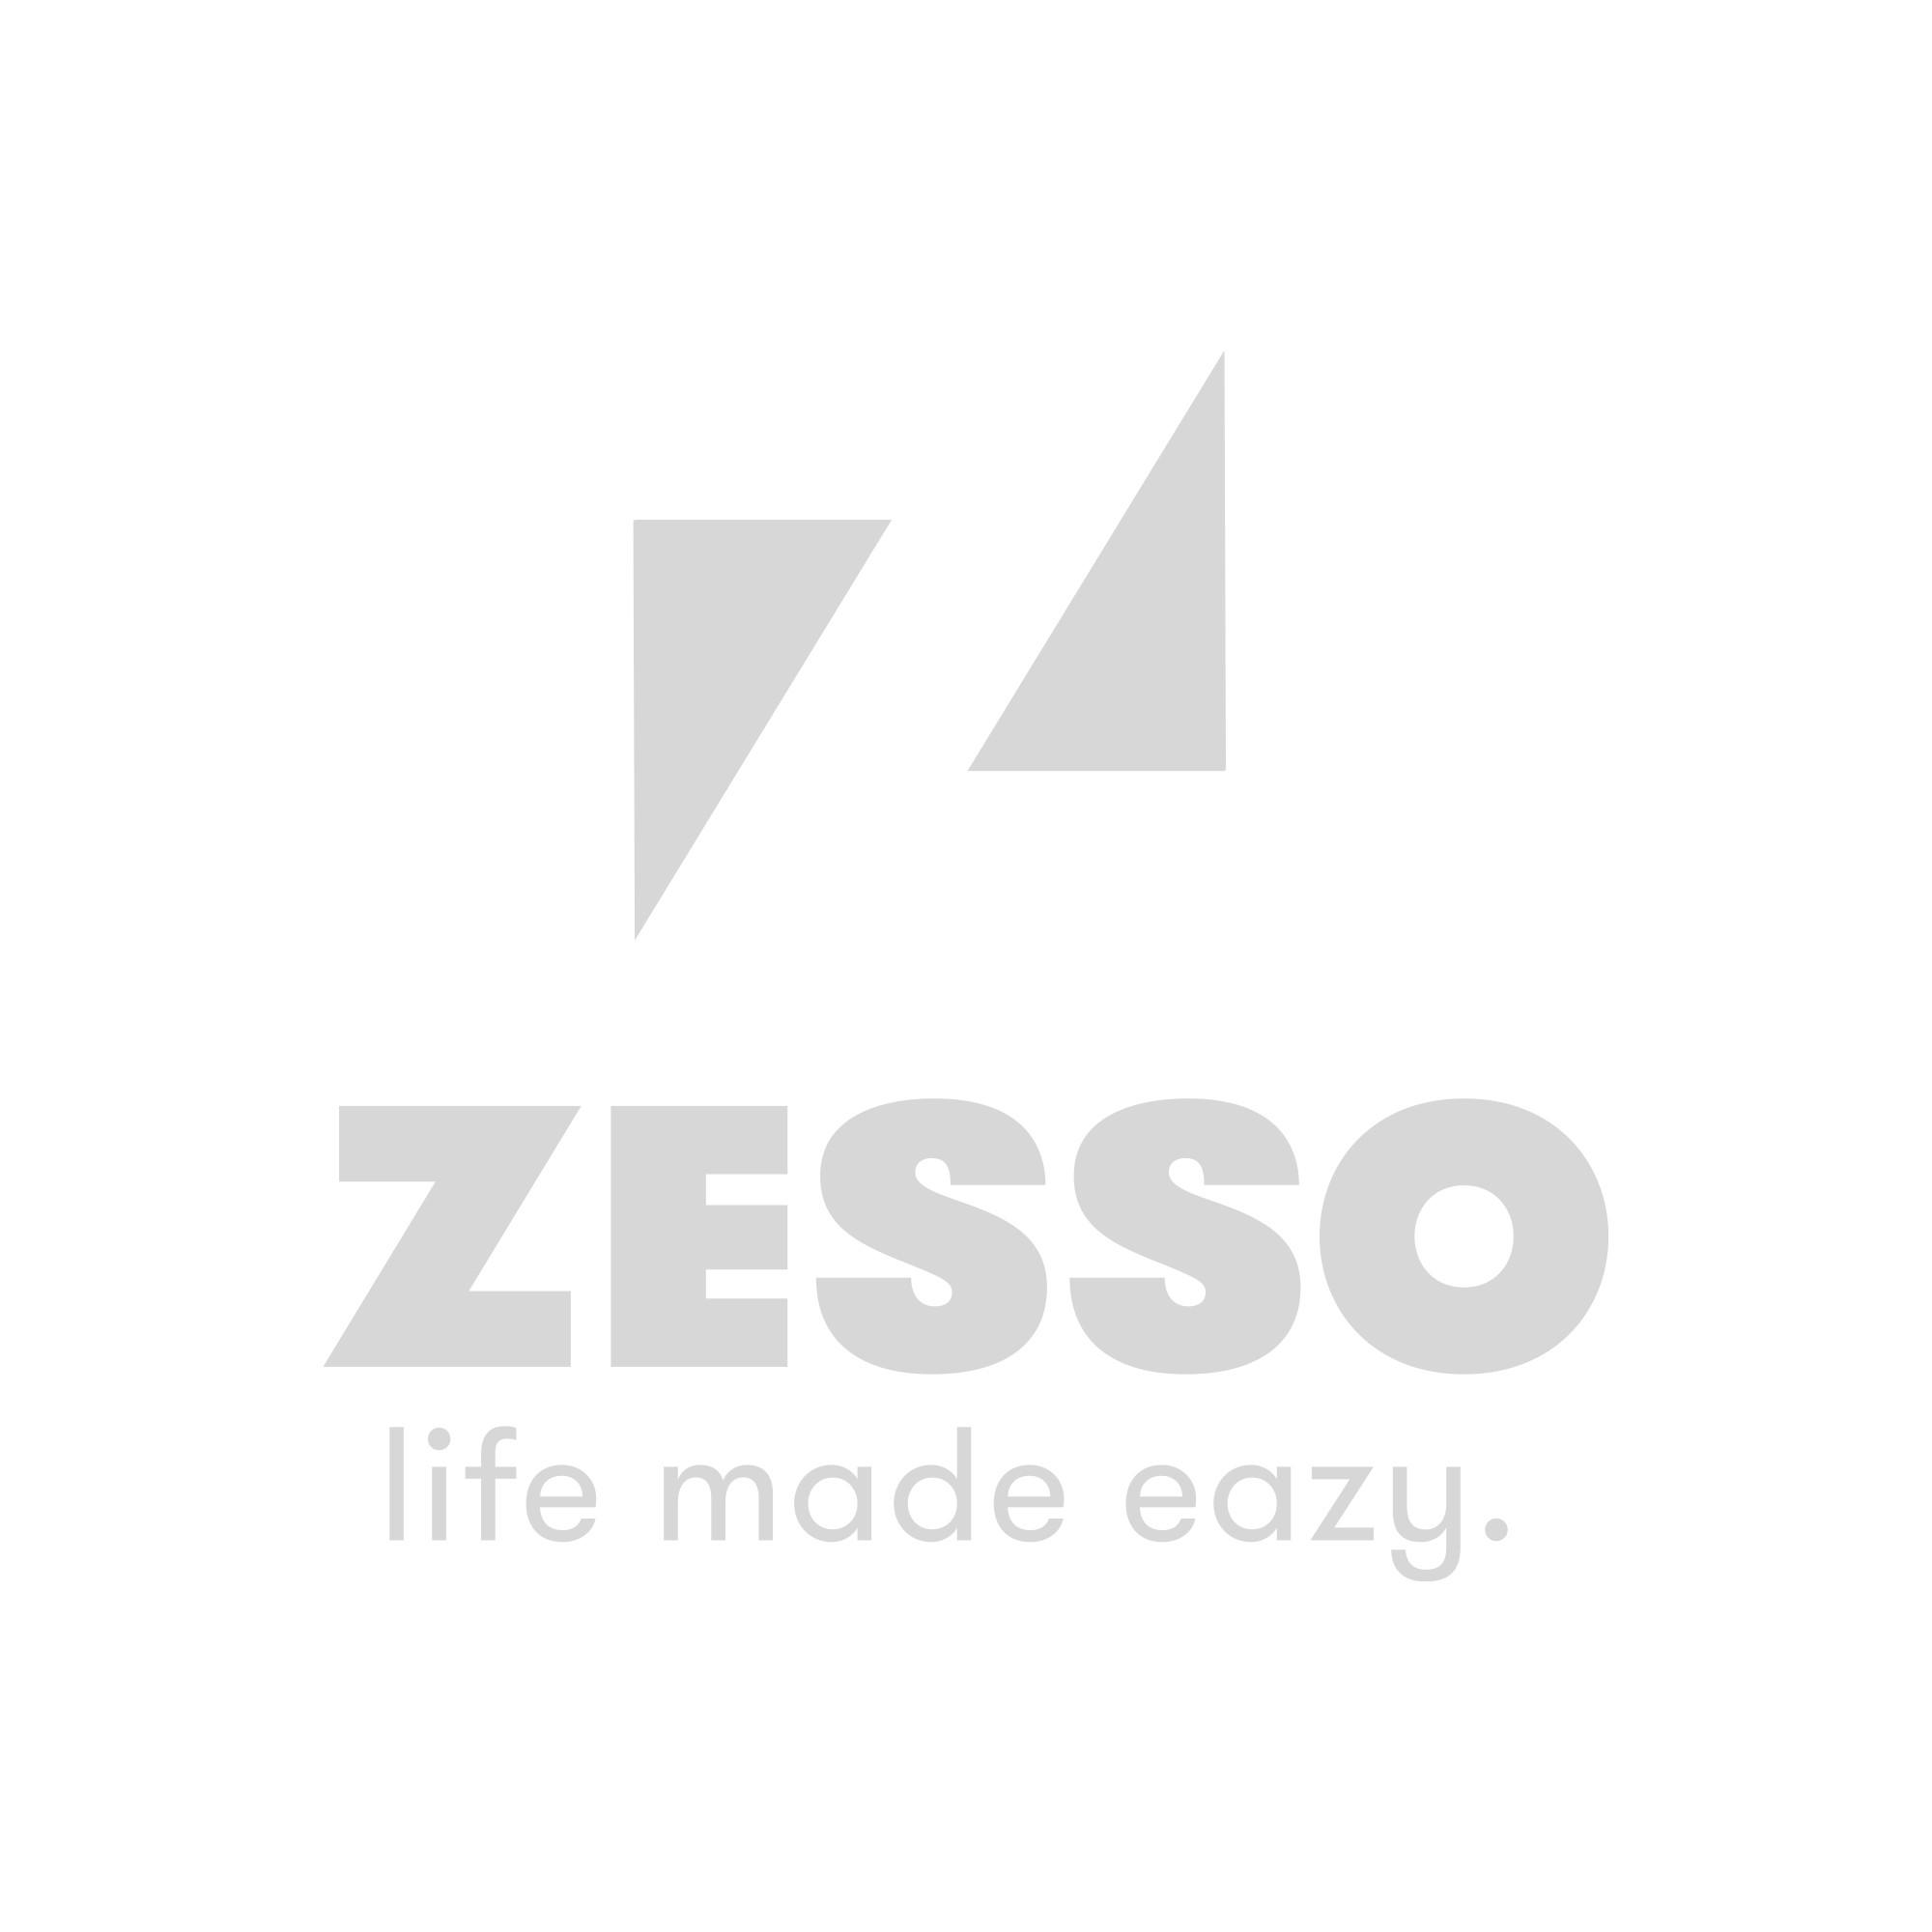 Ferrari F12 Berlinetta Elektrische Kinderauto 3 - 8 Jaar 6 V Wit